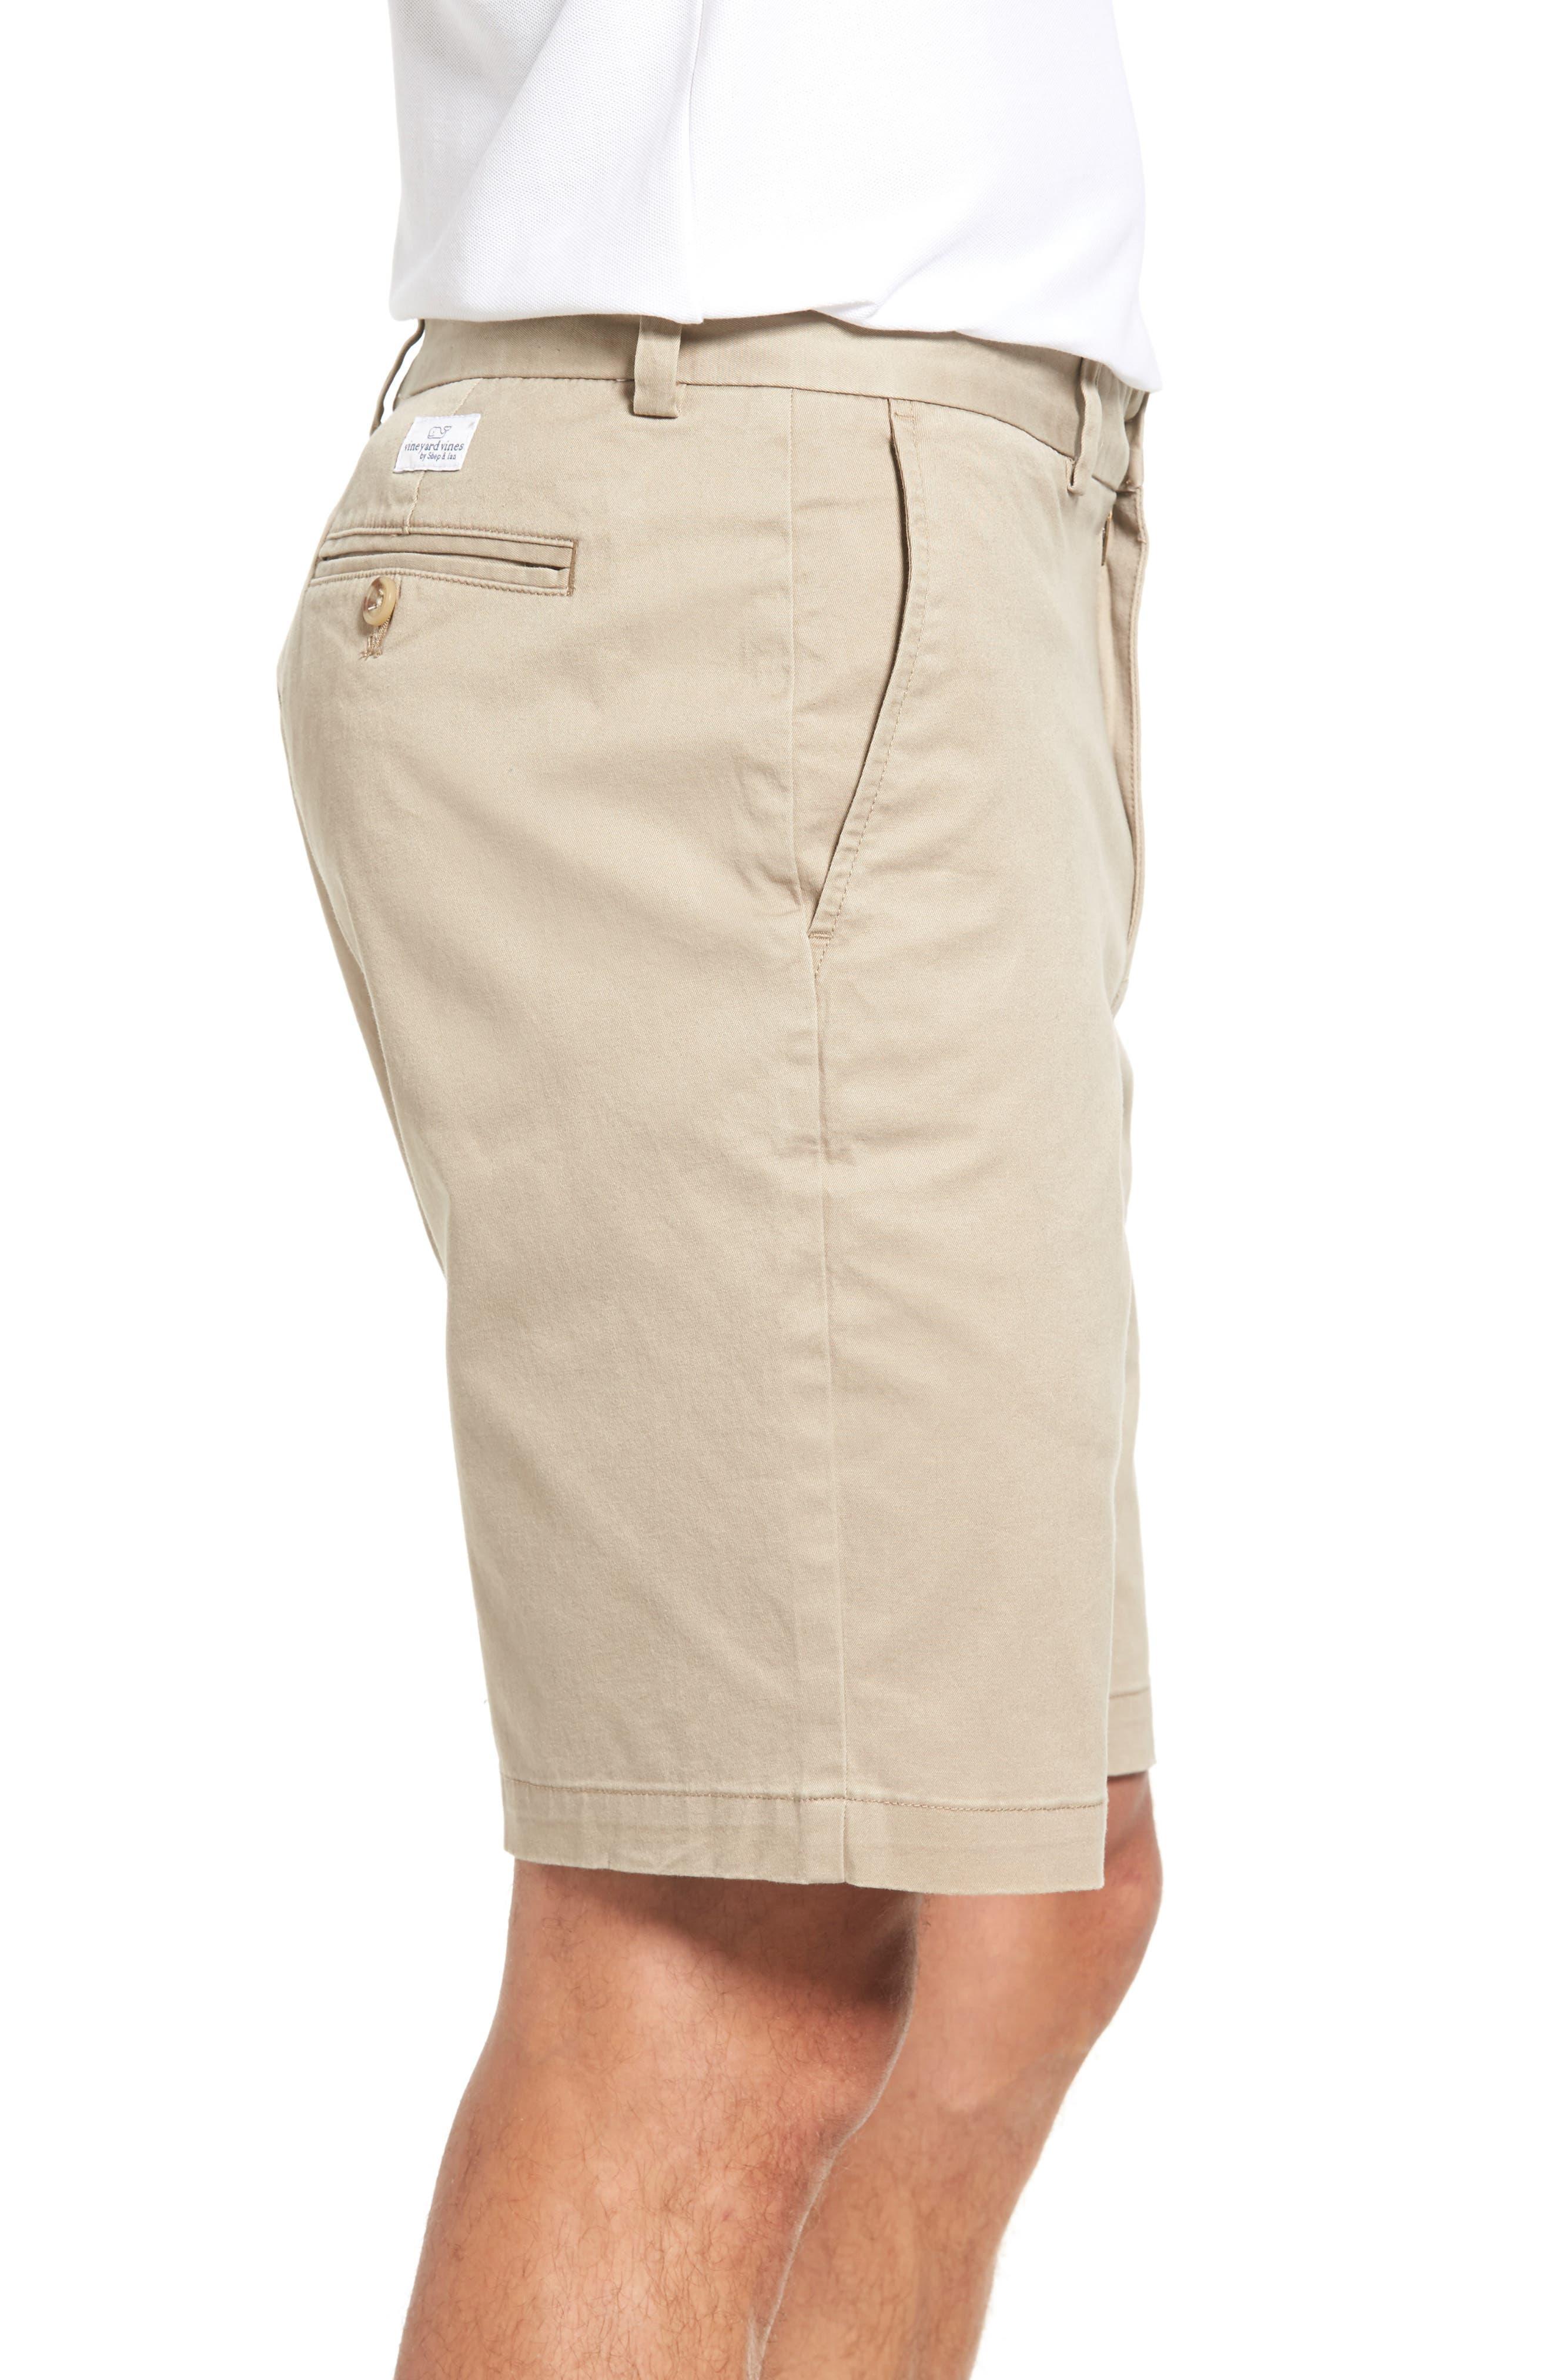 9 Inch Stretch Breaker Shorts,                             Alternate thumbnail 3, color,                             Khaki